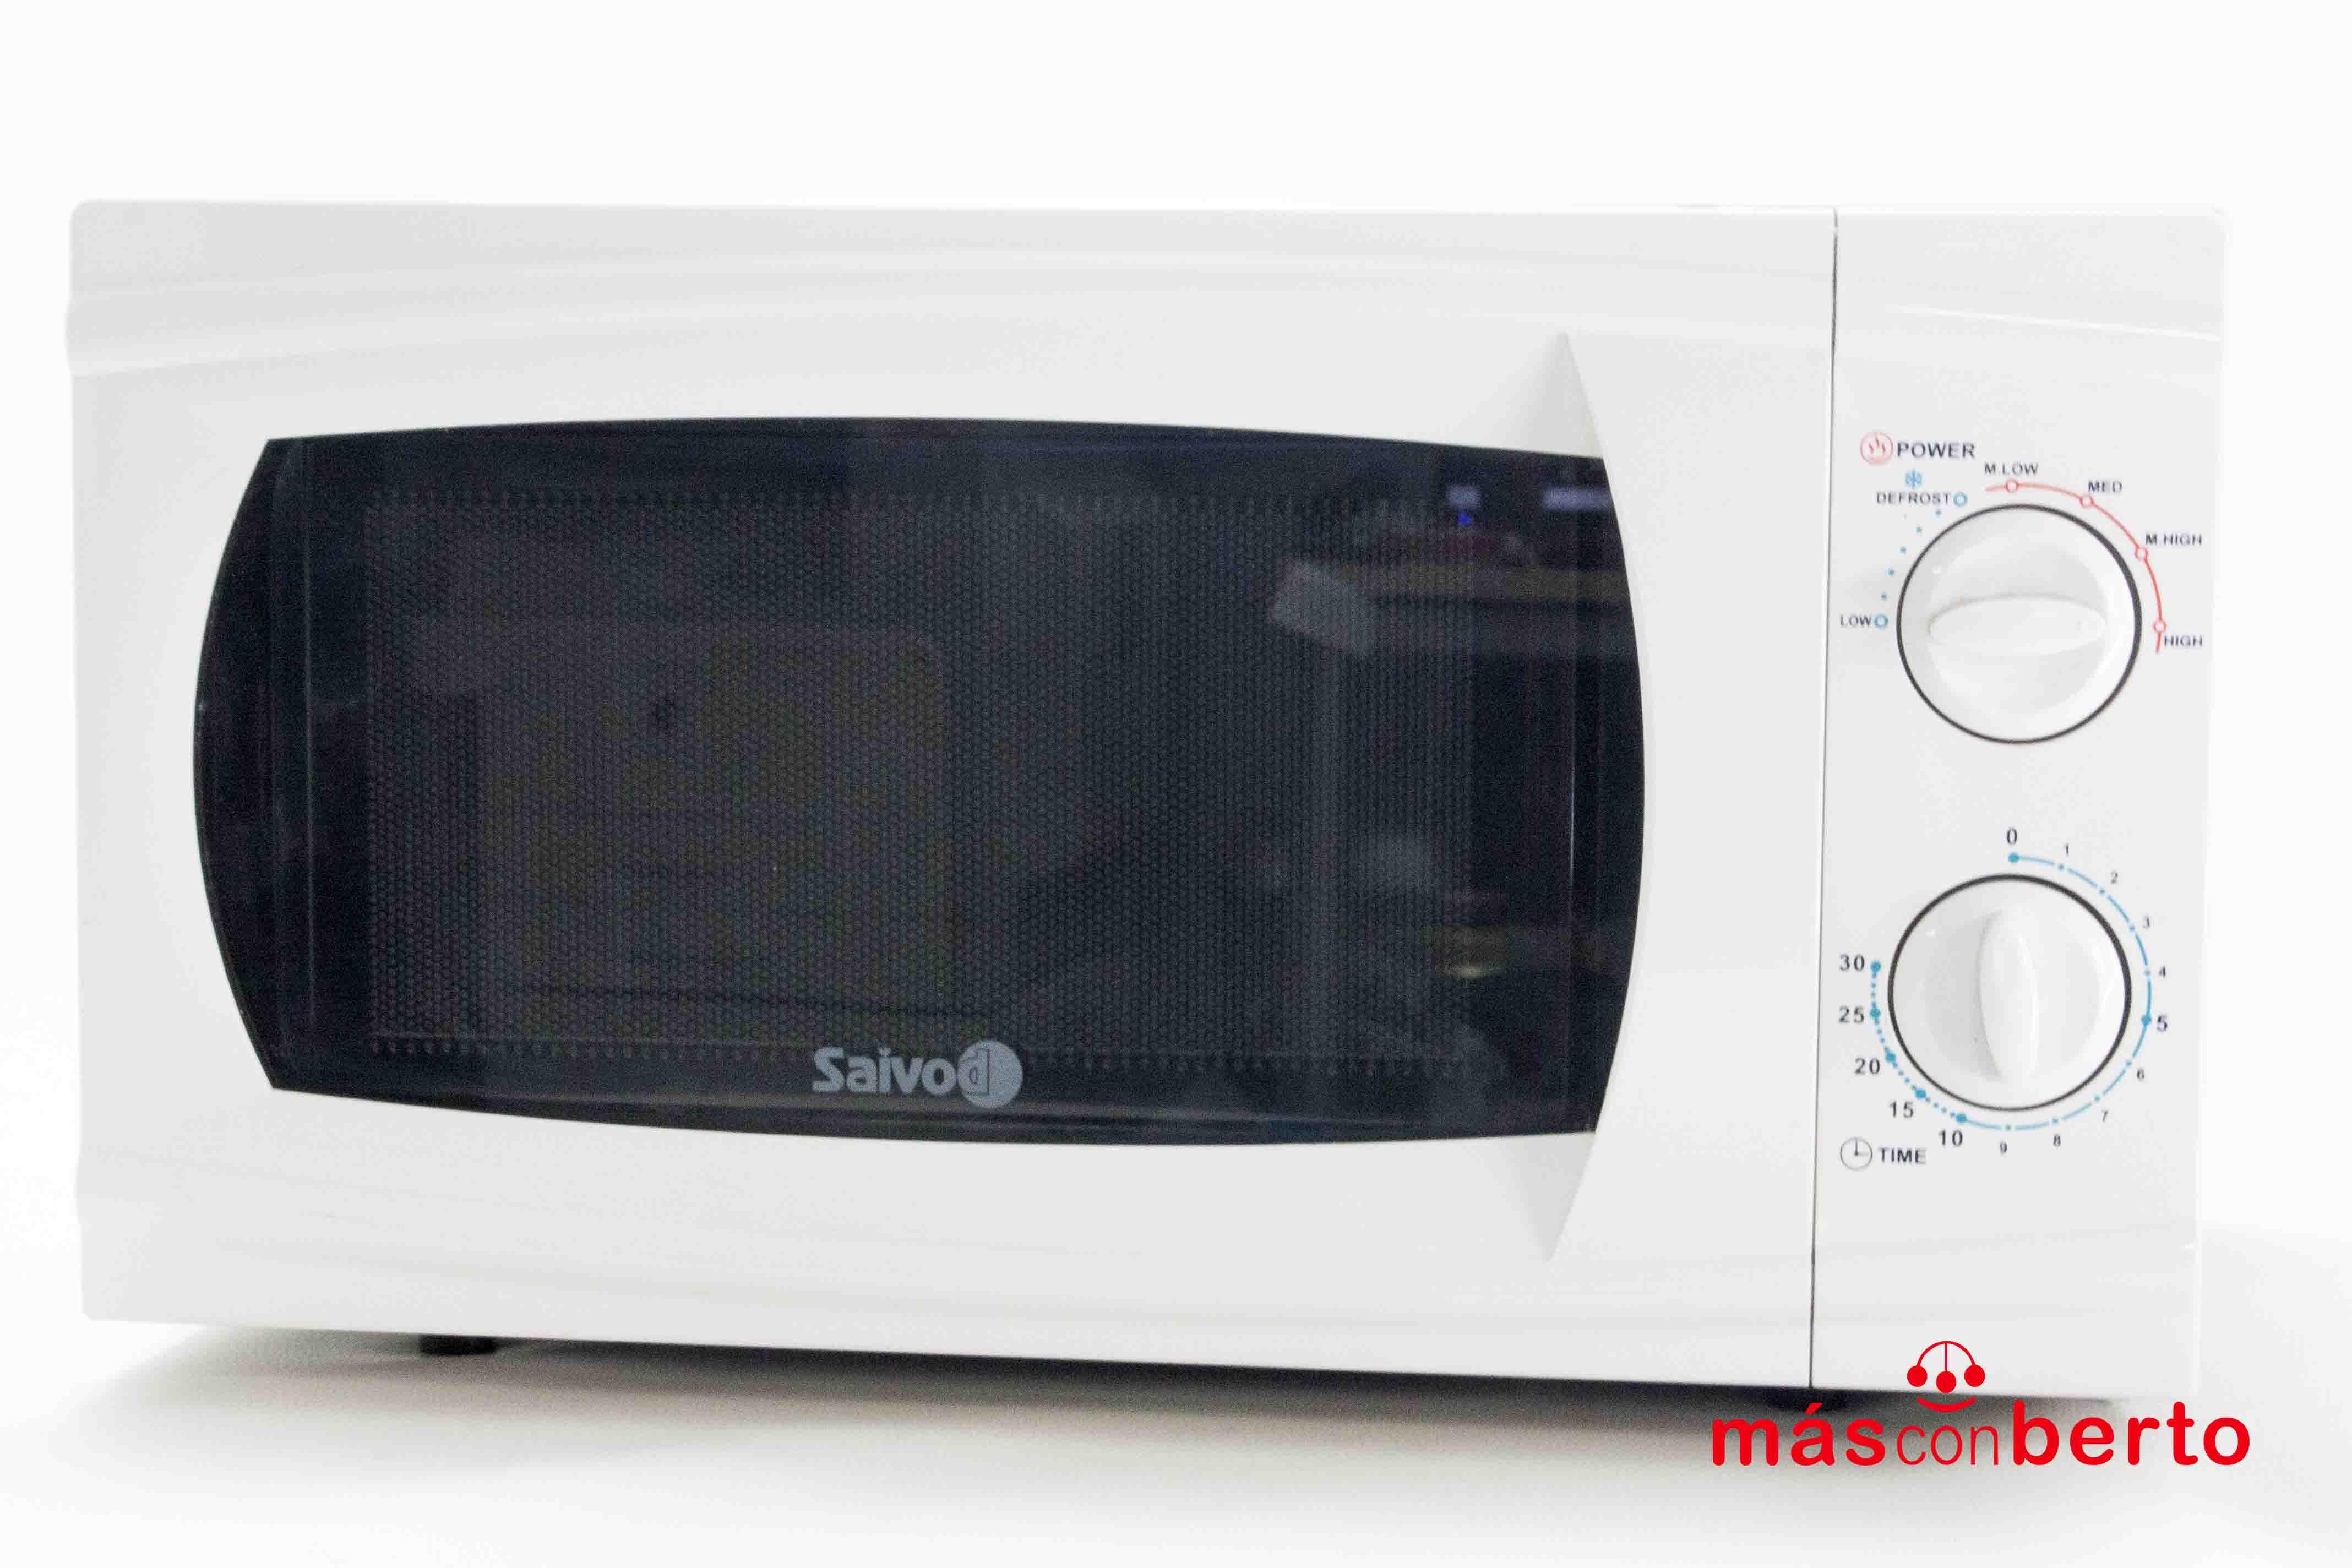 Microondas Savoid P80D 1200W